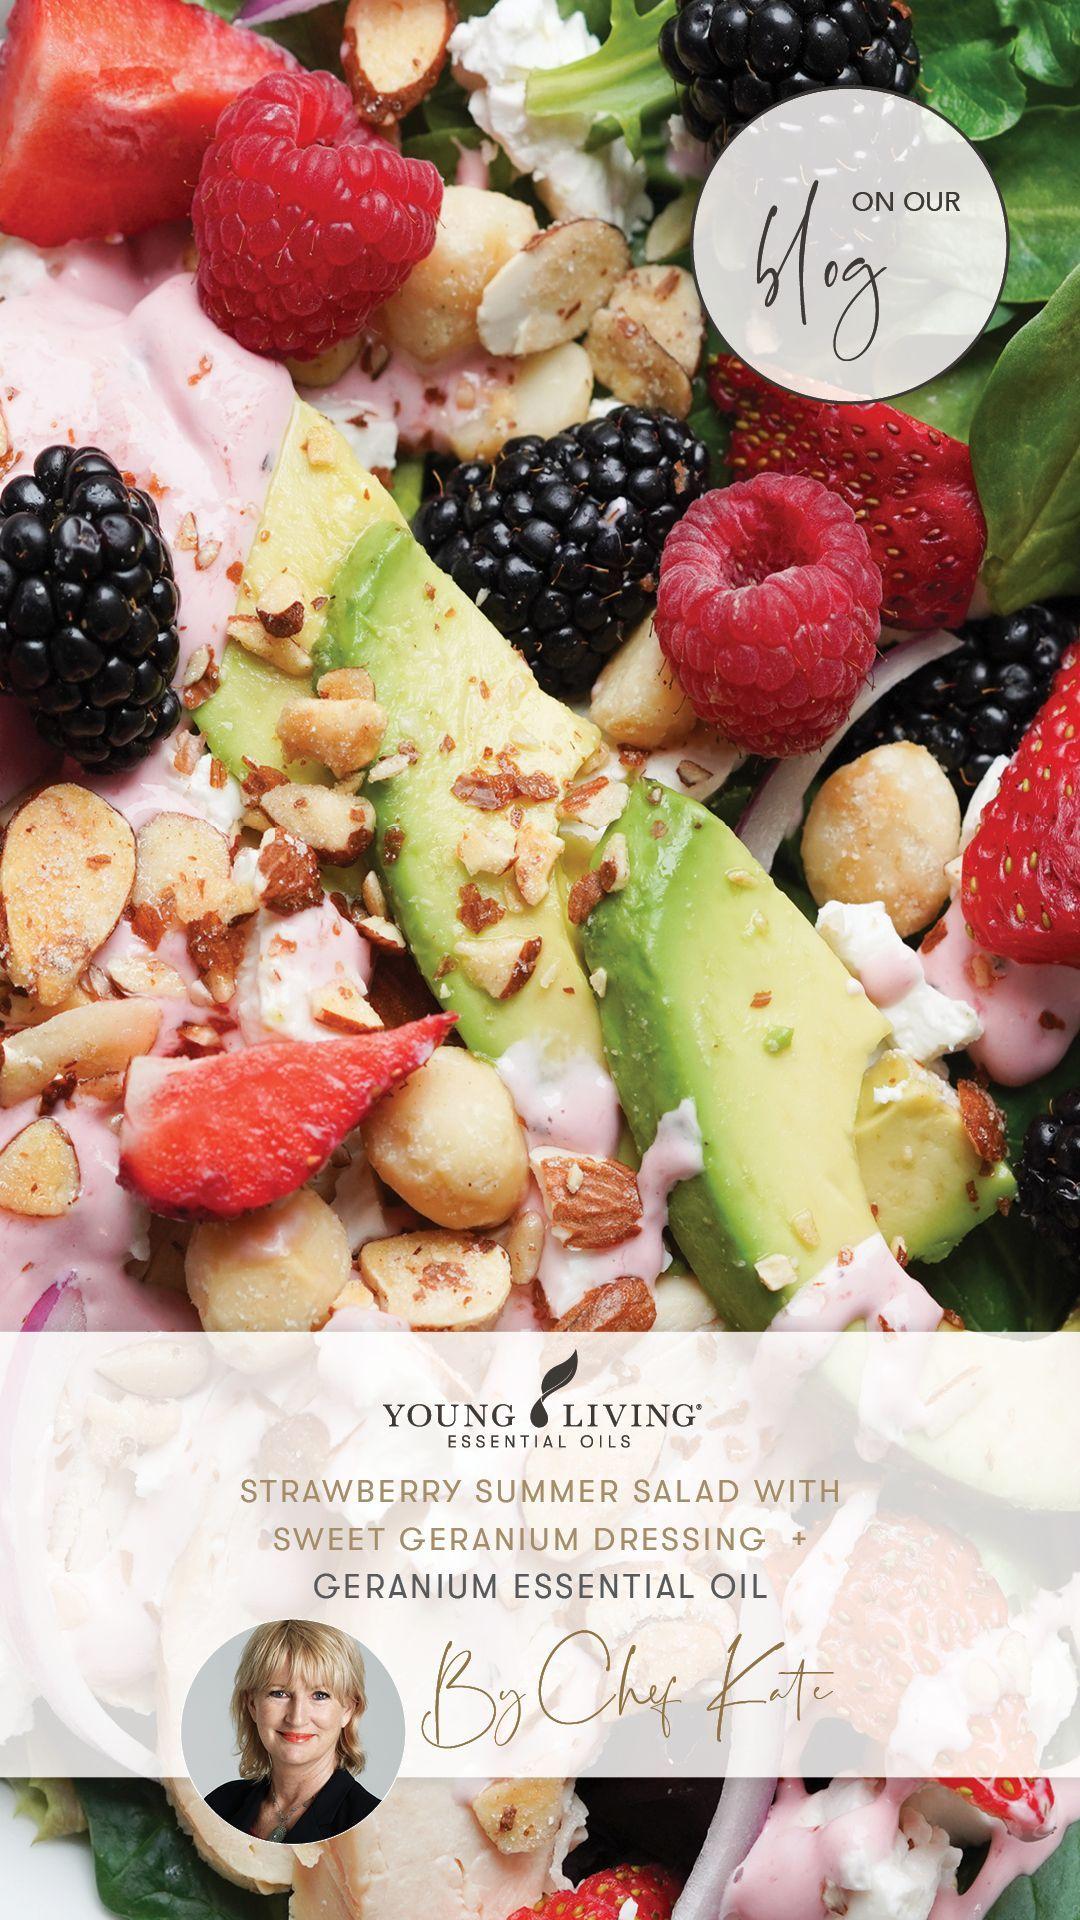 Strawberry Summer Salad Recipe Young Living Australia Blog Recipe In 2021 Blueberry Salad Fruit Salad Recipes Fruit Salad With Yogurt [ 1920 x 1080 Pixel ]